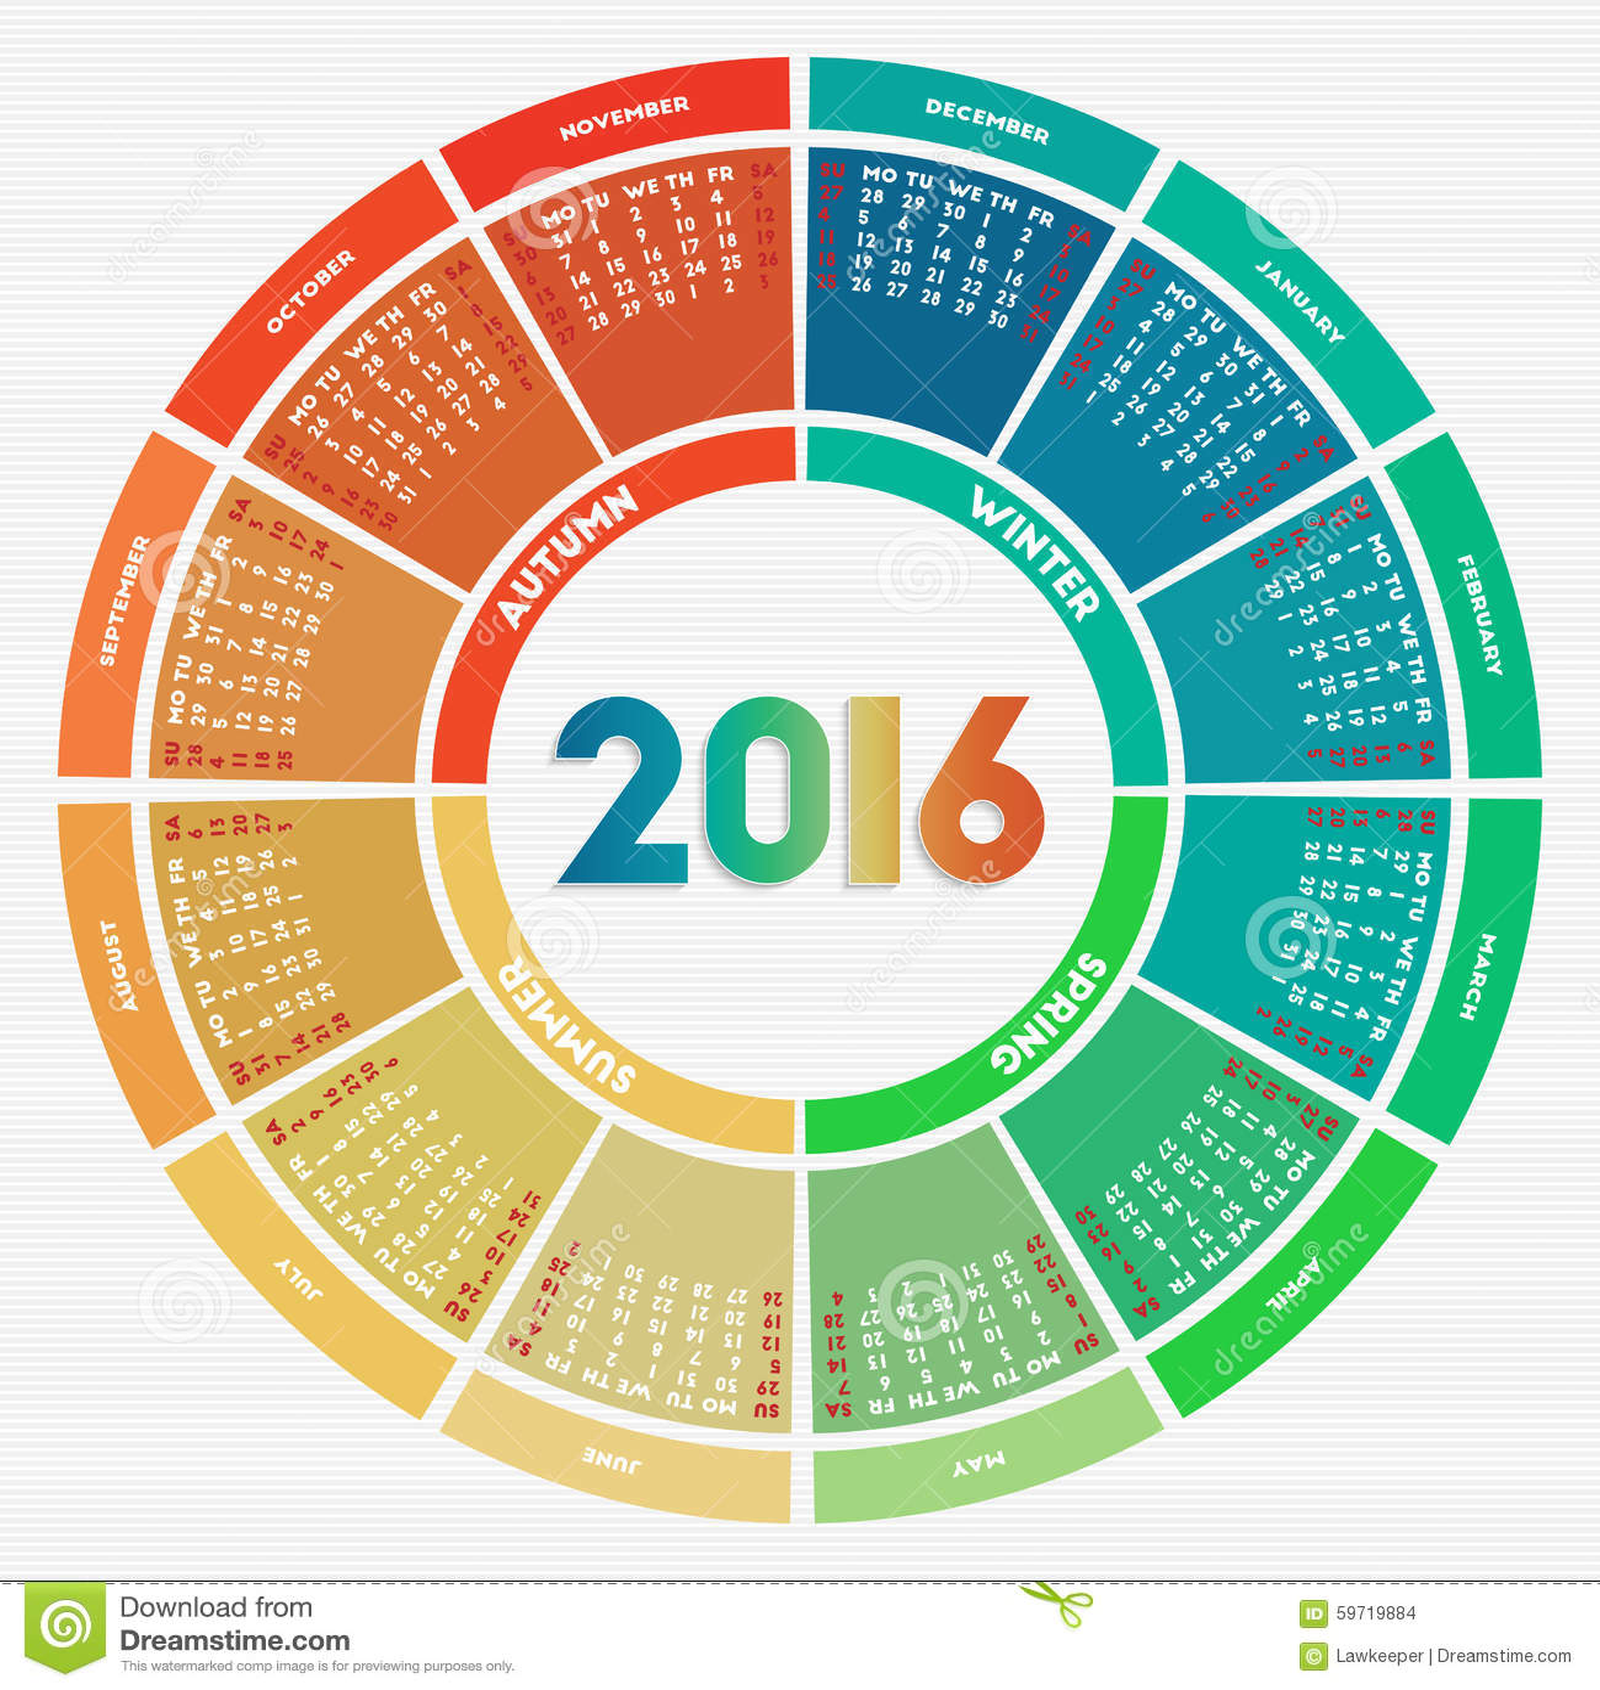 bunter runder kalender 2016 vektor abbildung. Black Bedroom Furniture Sets. Home Design Ideas